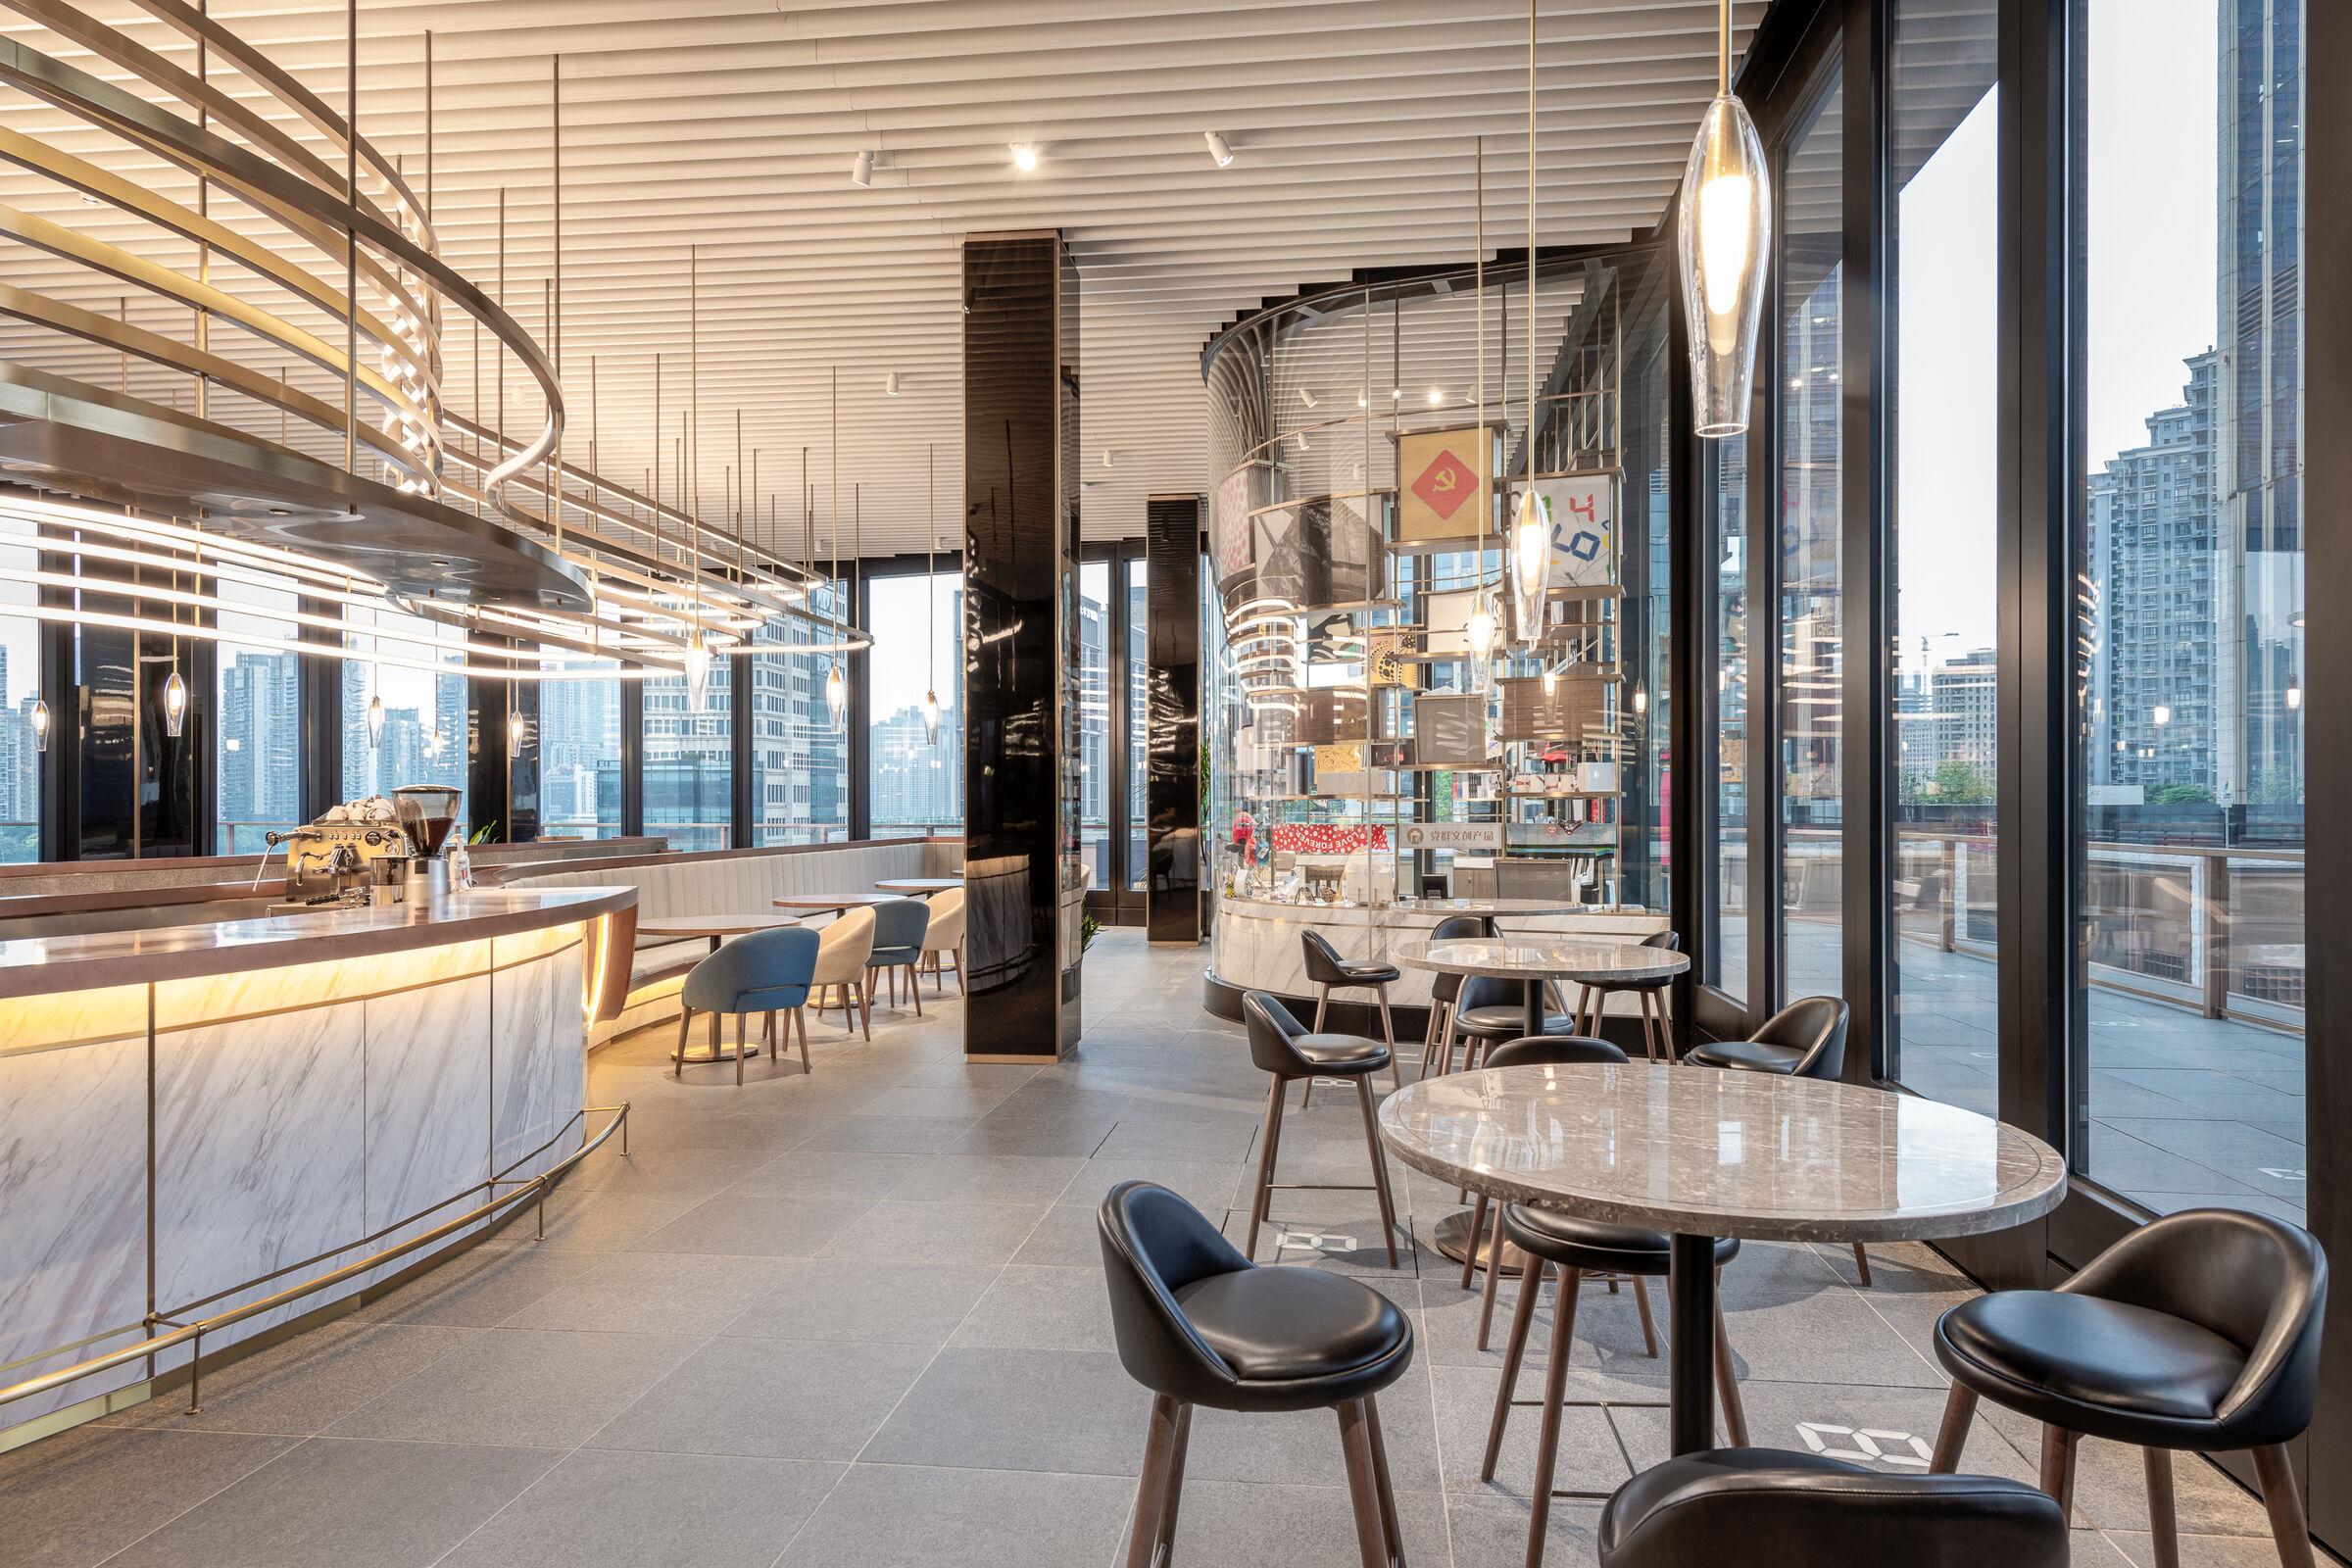 6-high tables for landscape view-高桌区可欣赏极佳的室外景观.jpg